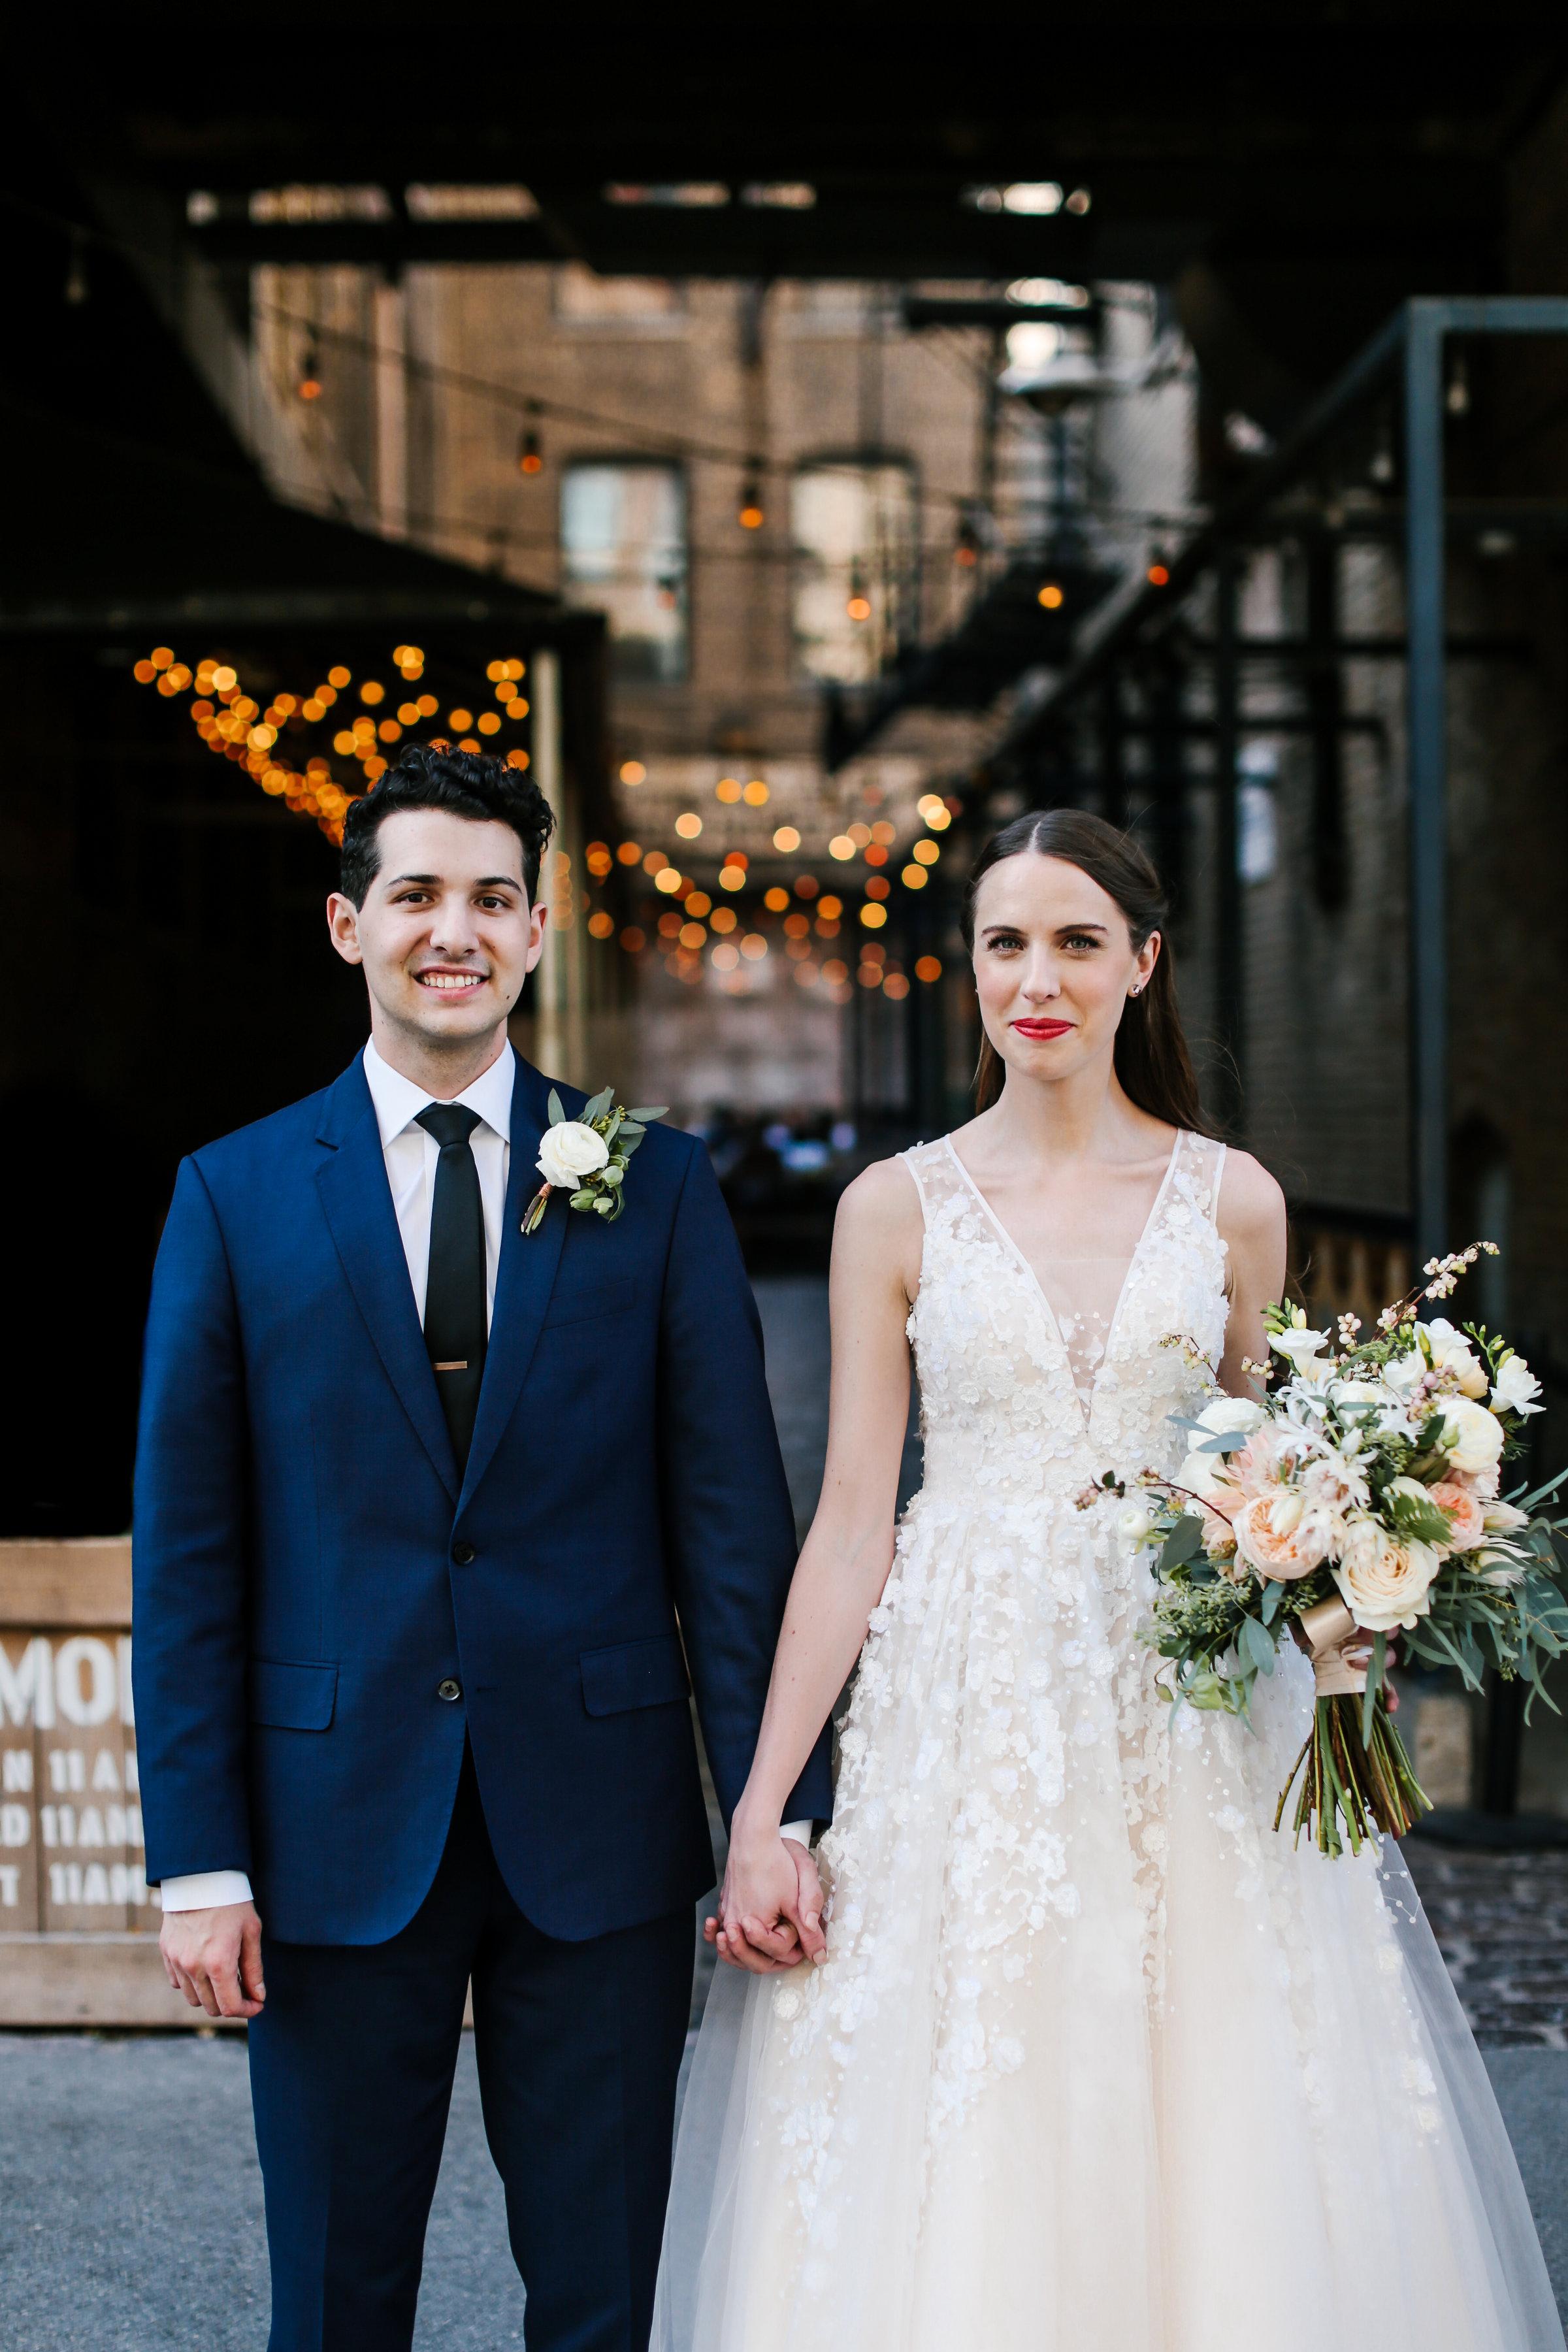 Wedding-Photo-183.jpg